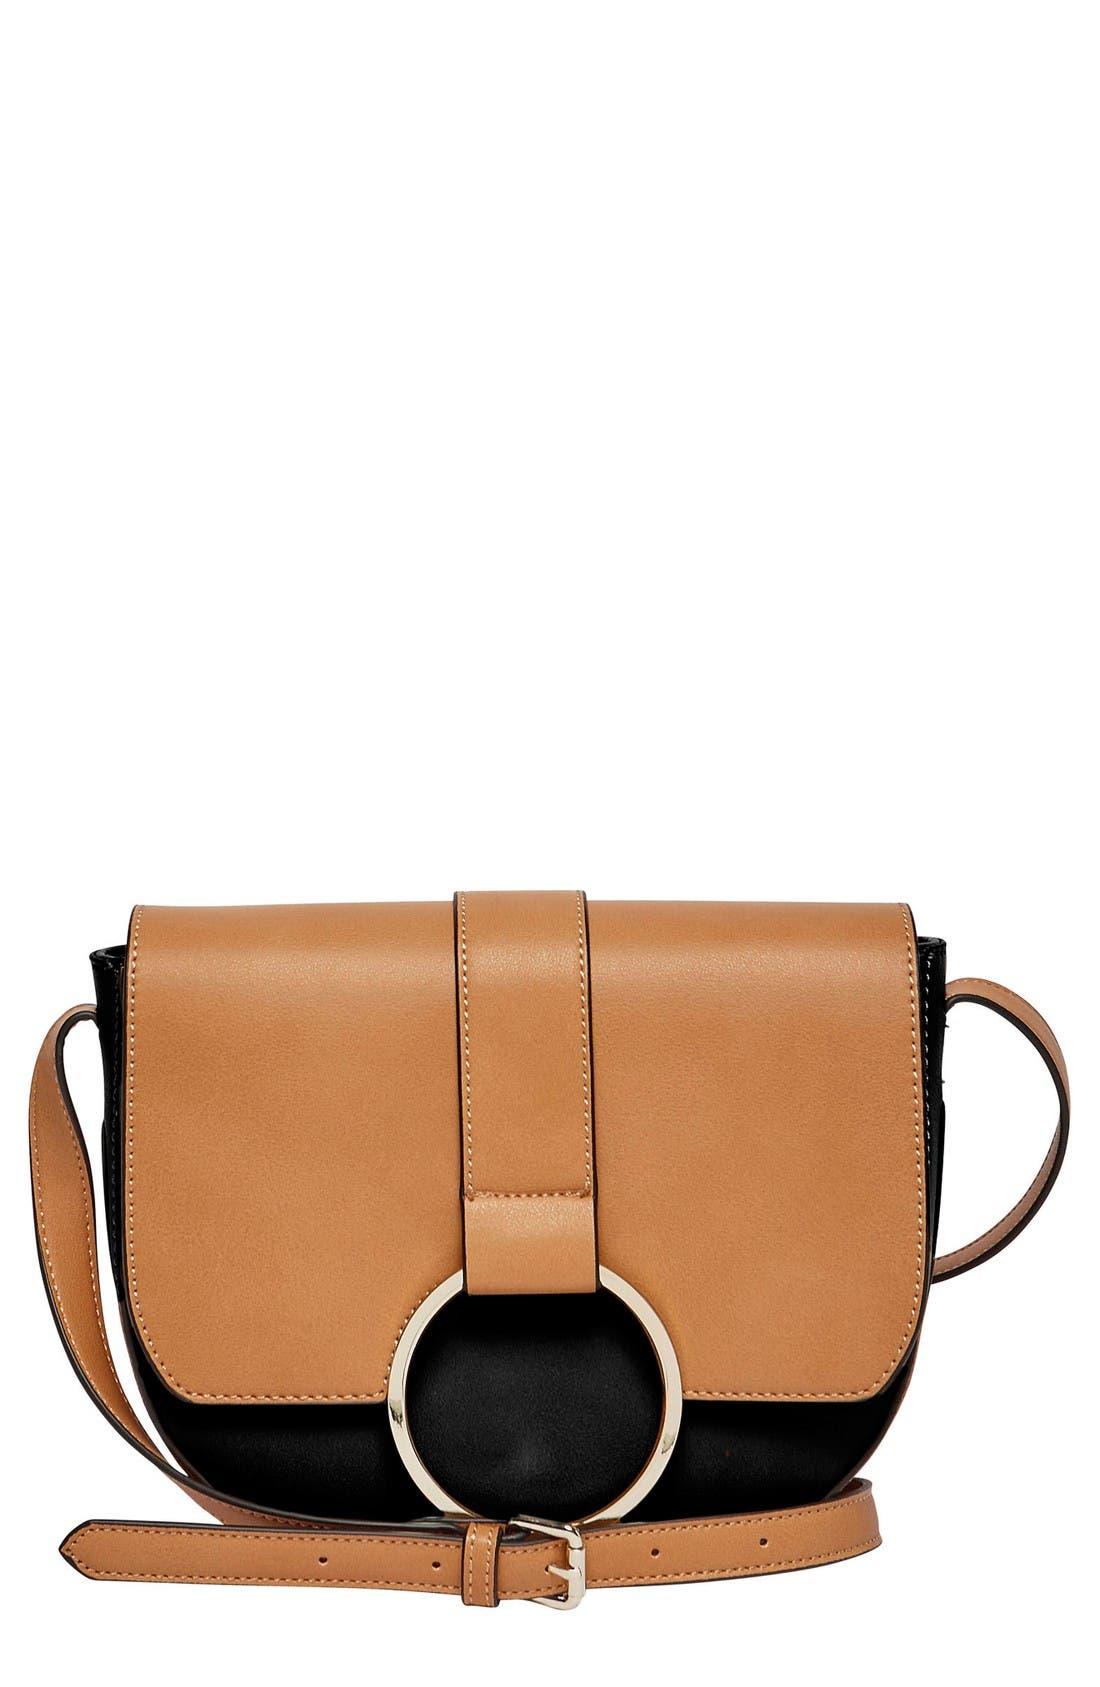 Alternate Image 1 Selected - Urban Originals Reckless Destiny Vegan Leather Saddle Bag